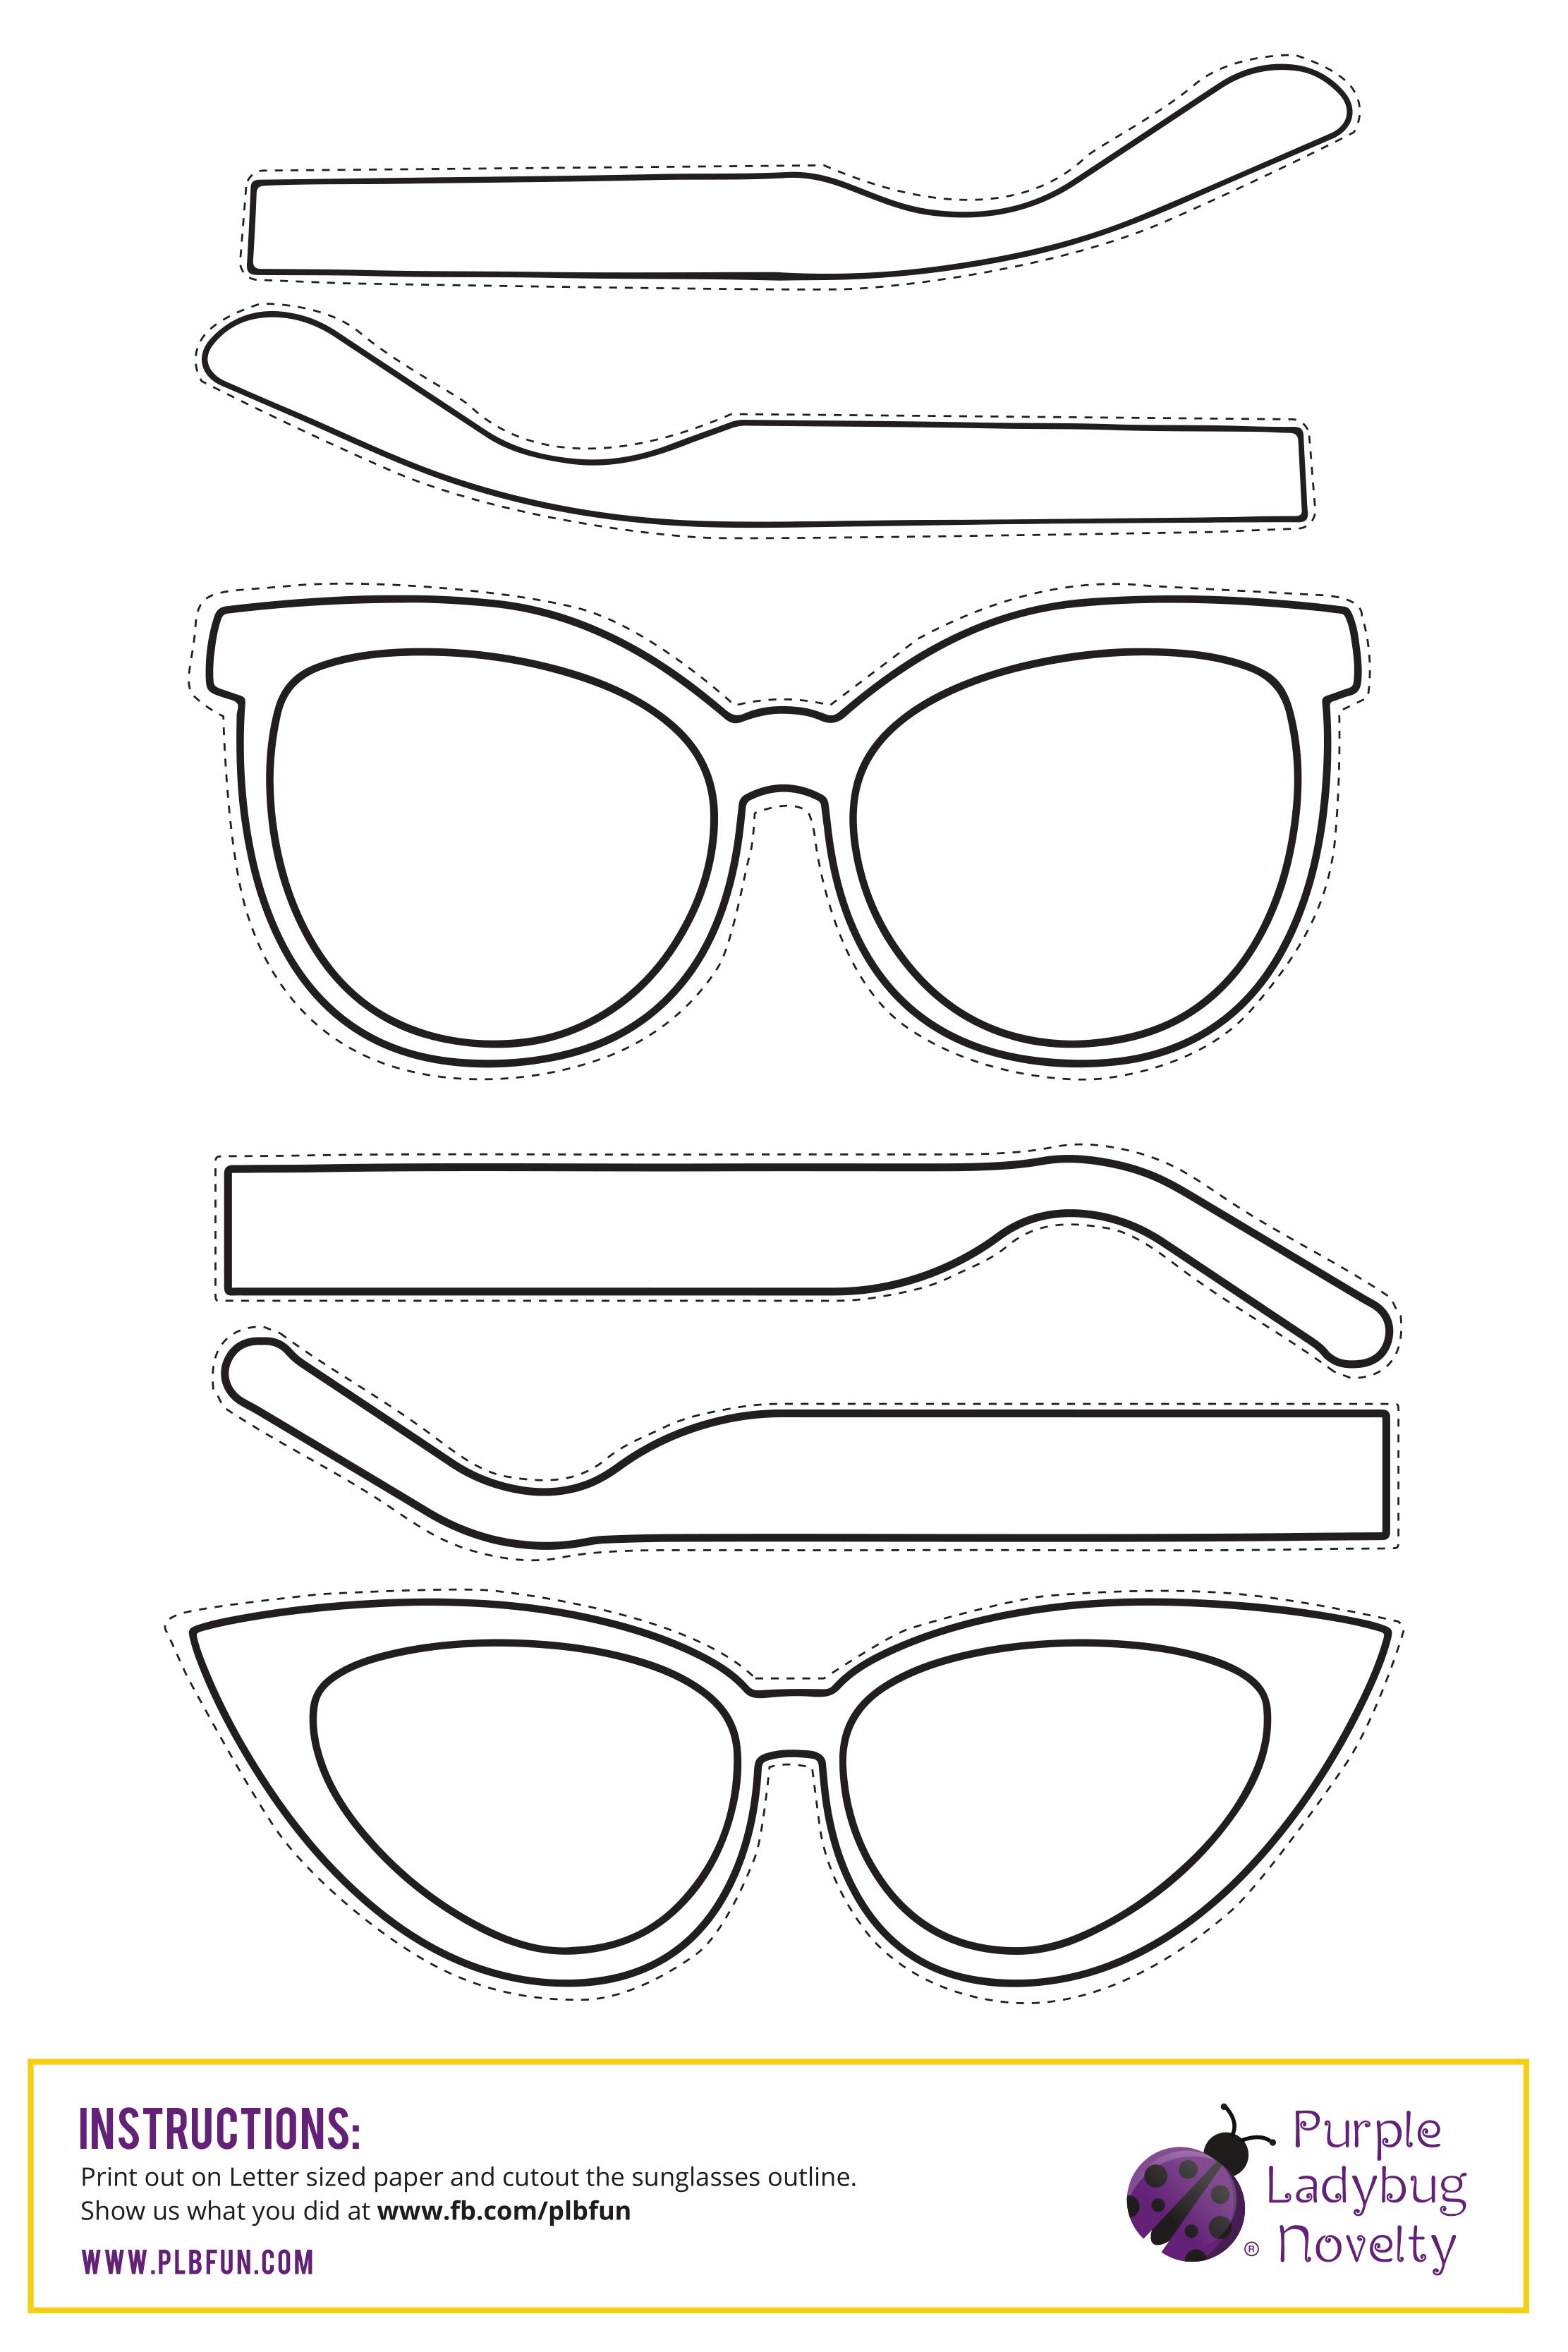 Free Printable Sunglasses Day Diy Glasses Templates Printable Free Purple Ladybugs